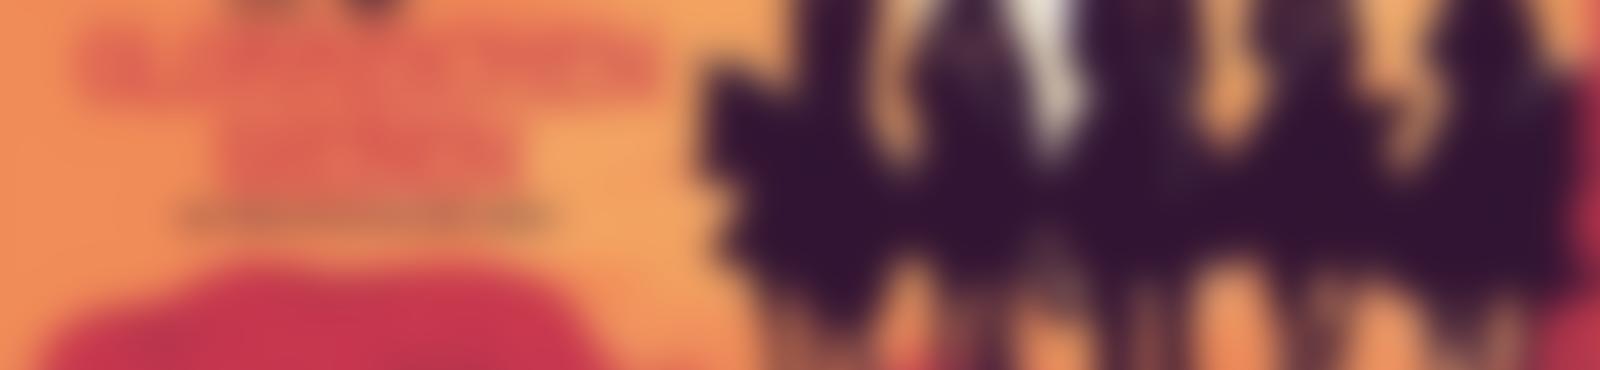 Blurred d3bef03e 0450 42db a68c e04ecad5b938